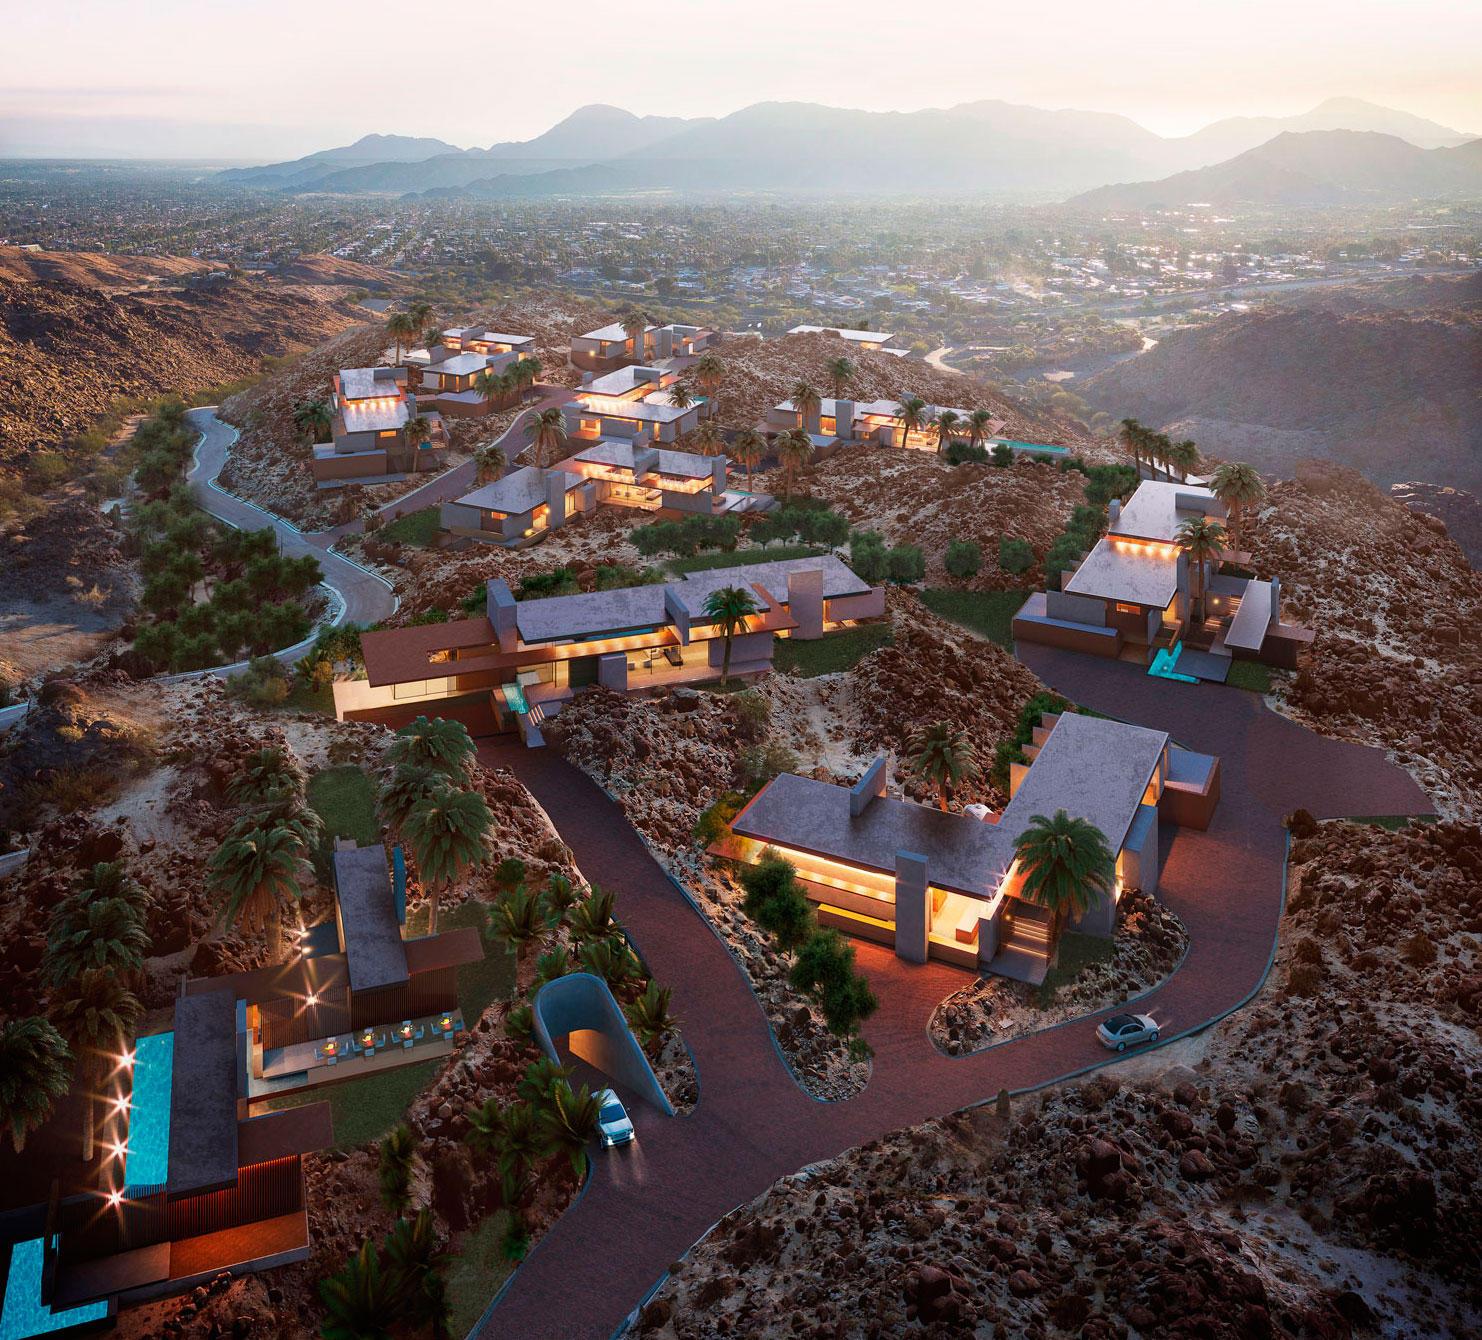 Photo of Lot 7 Nighthawk Estates, Palm Desert, CA 92260